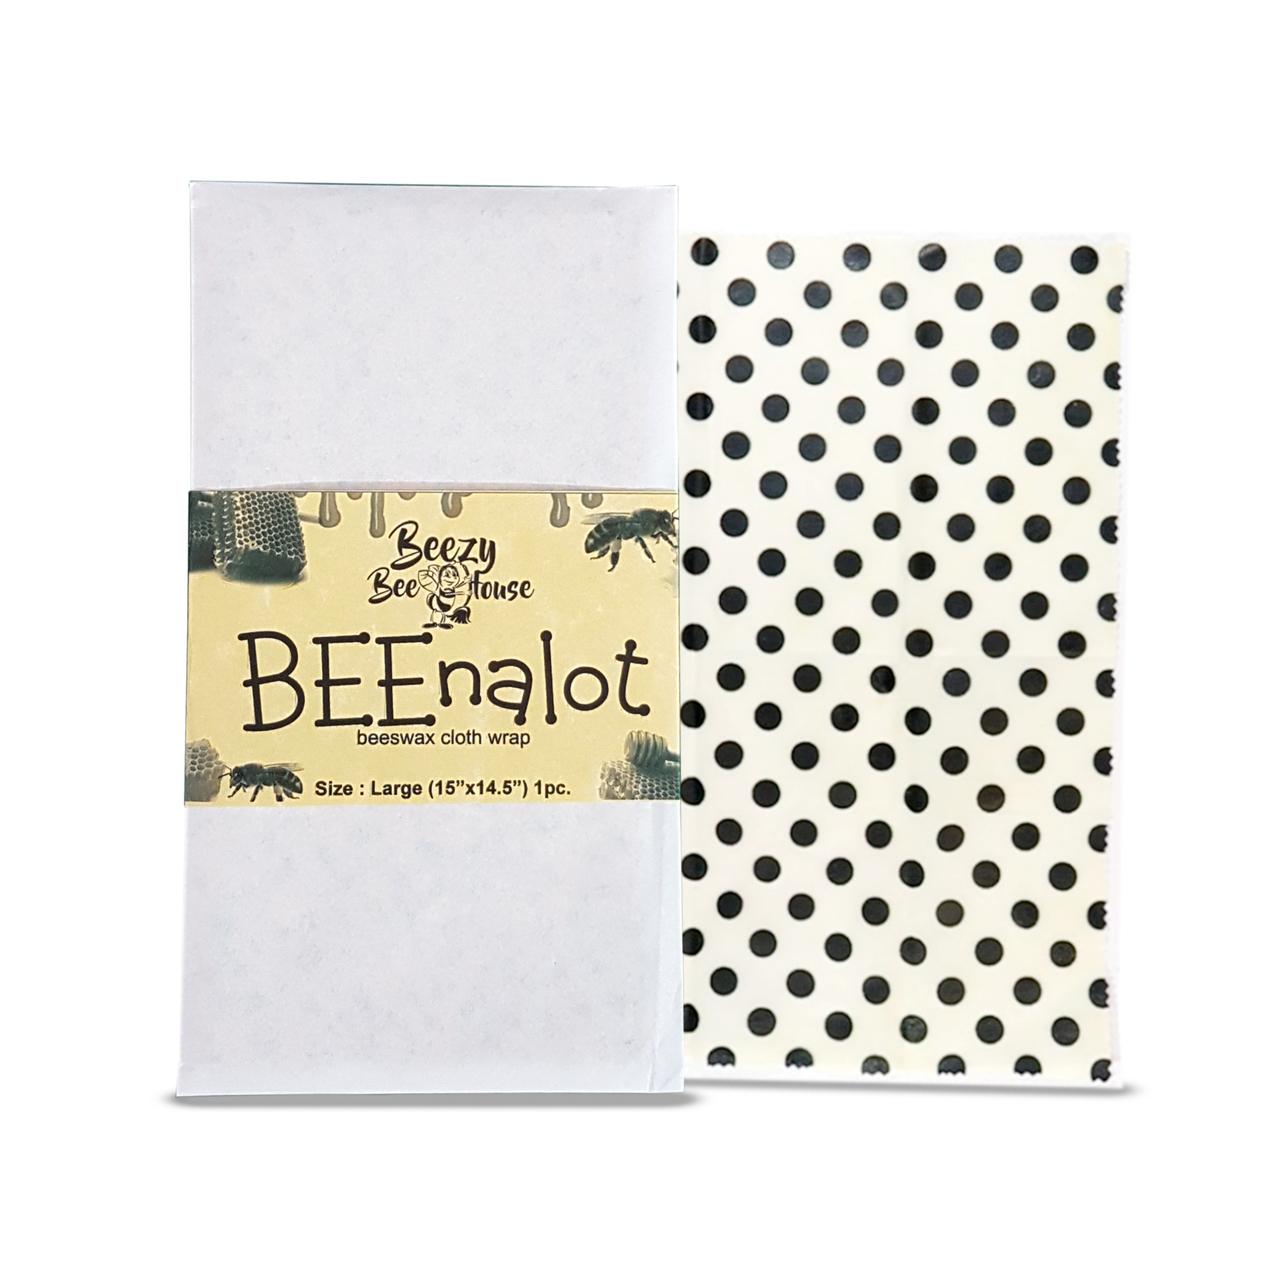 Source: http://www.milea.ph/natuwrap-reusable-beeswax-food-wraps/